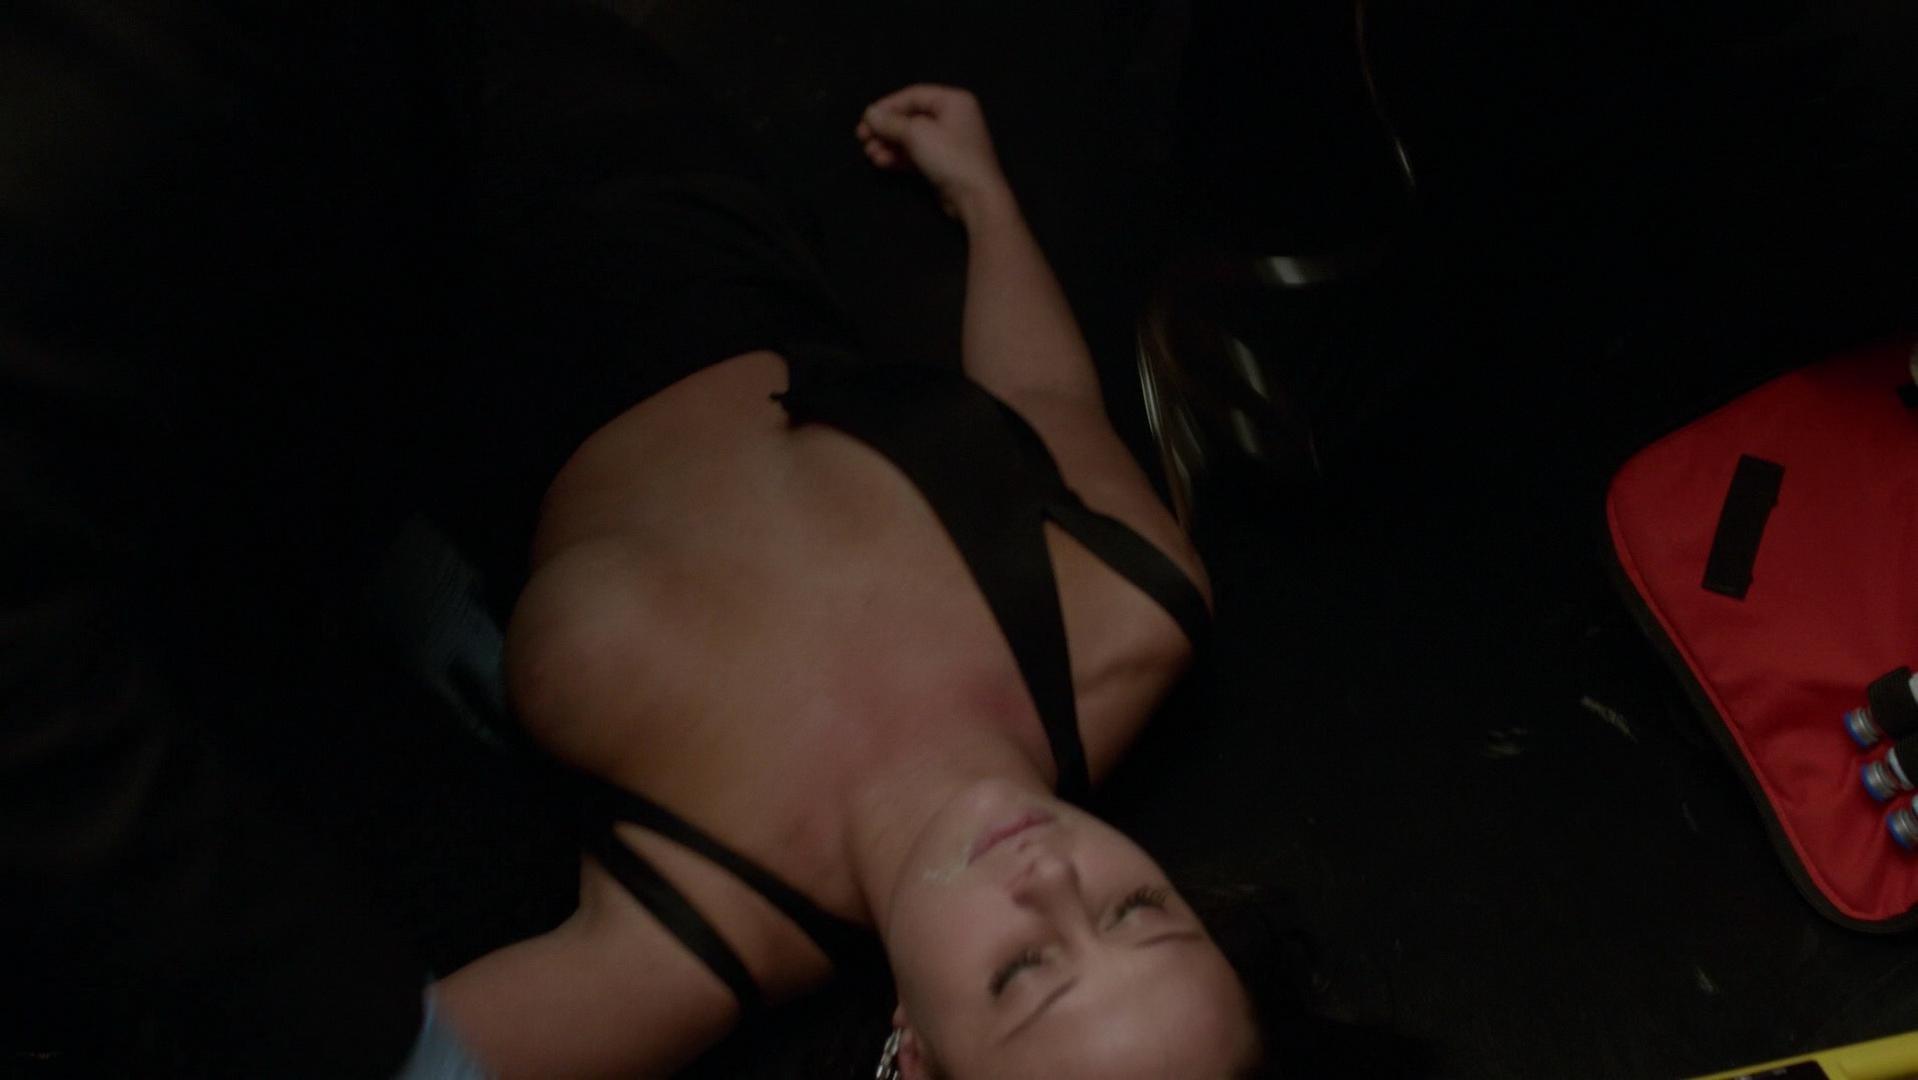 Madison McKinley nude - Power s01e03 (2014)